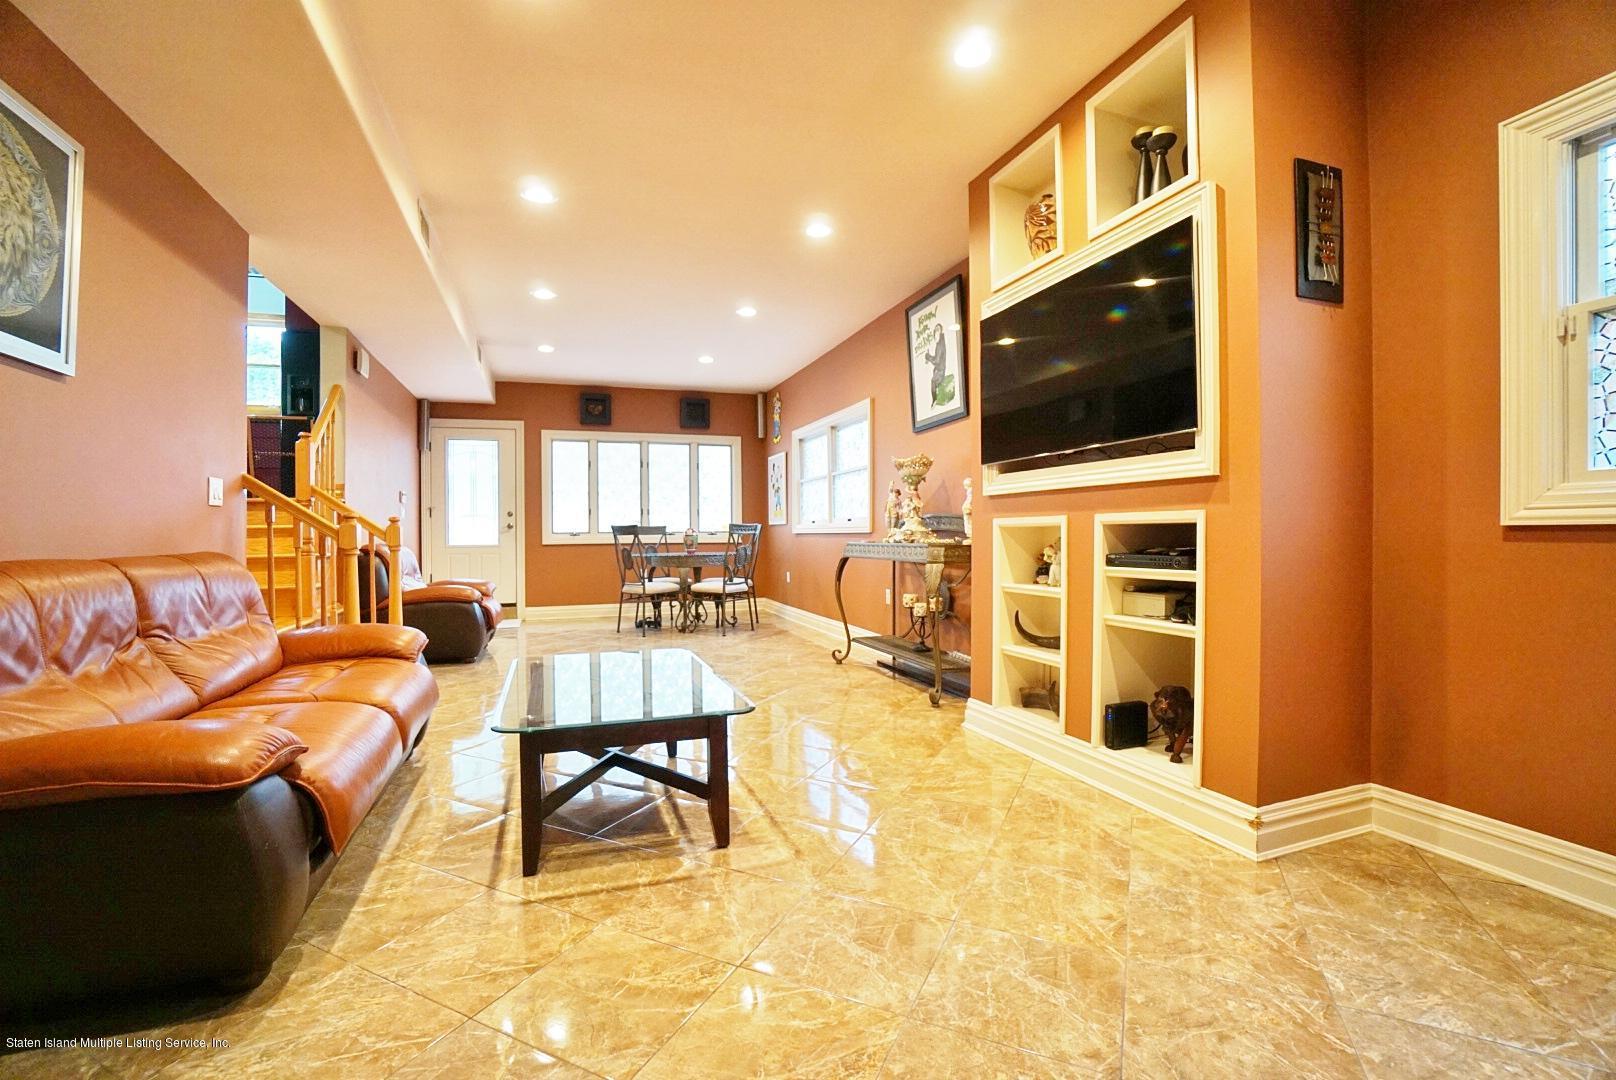 Single Family - Detached 48 Ocean Terrace  Staten Island, NY 10314, MLS-1130826-29